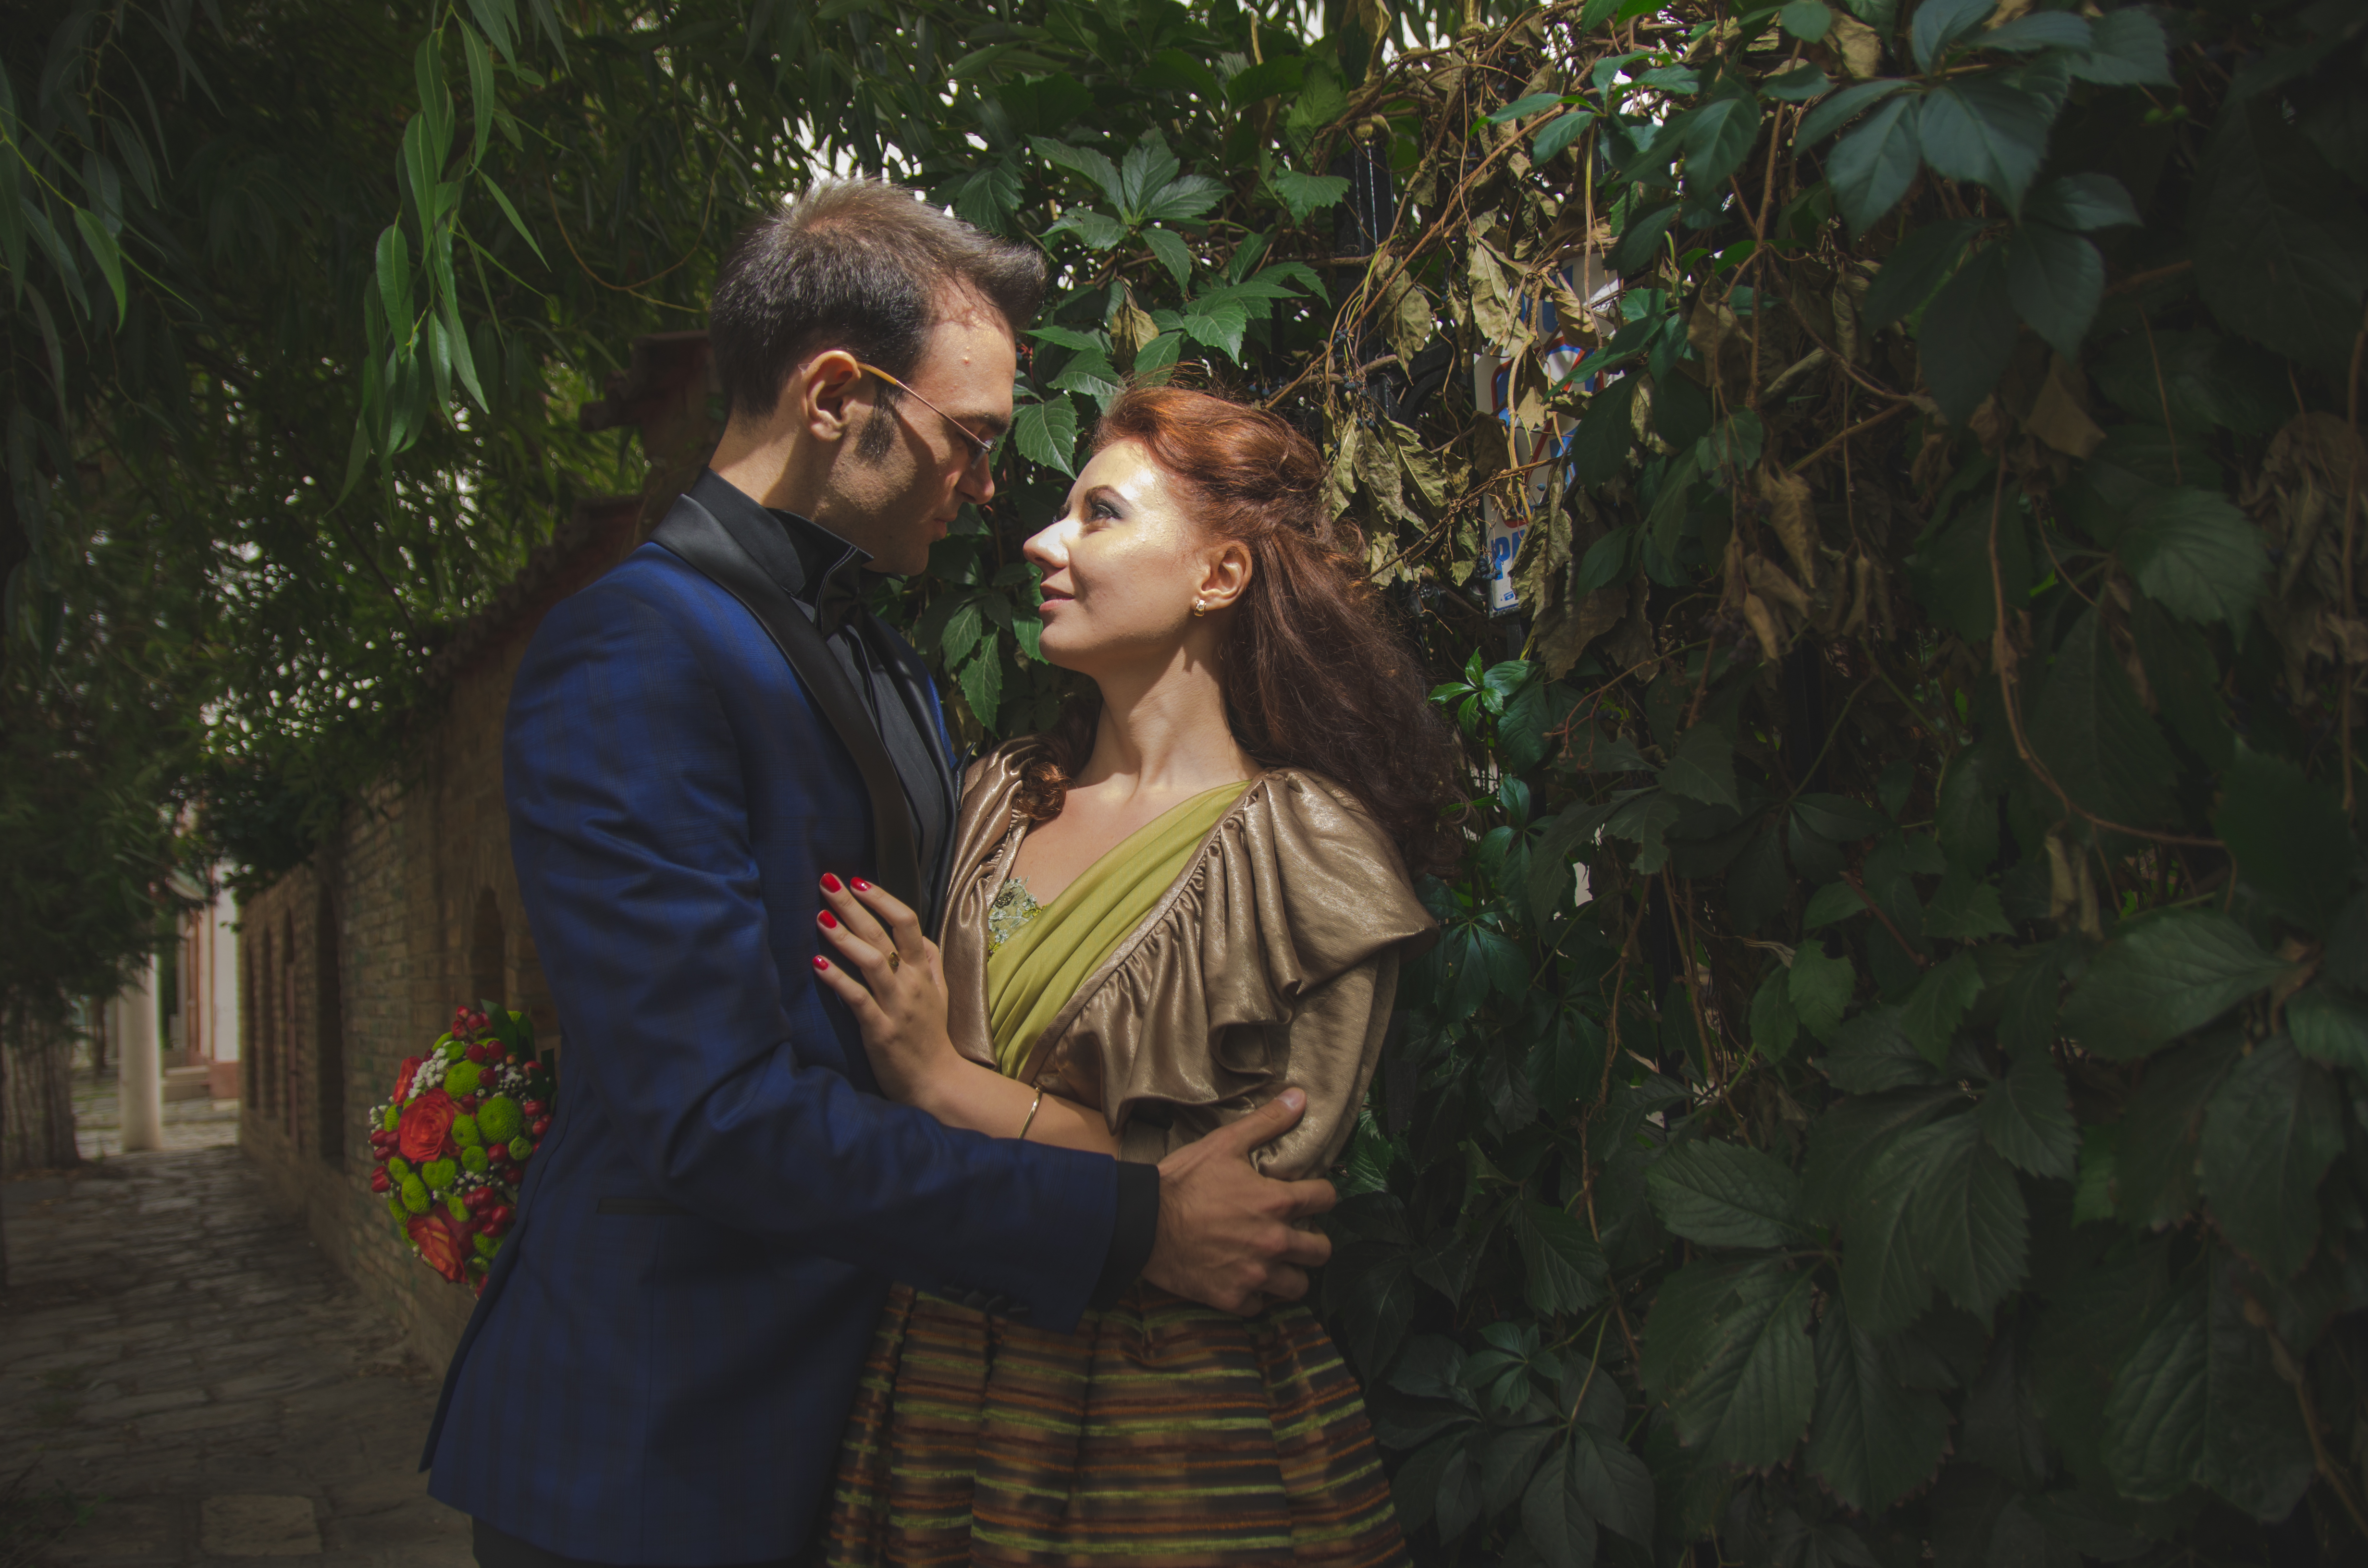 Fotografii logodna Madalina si Theodor